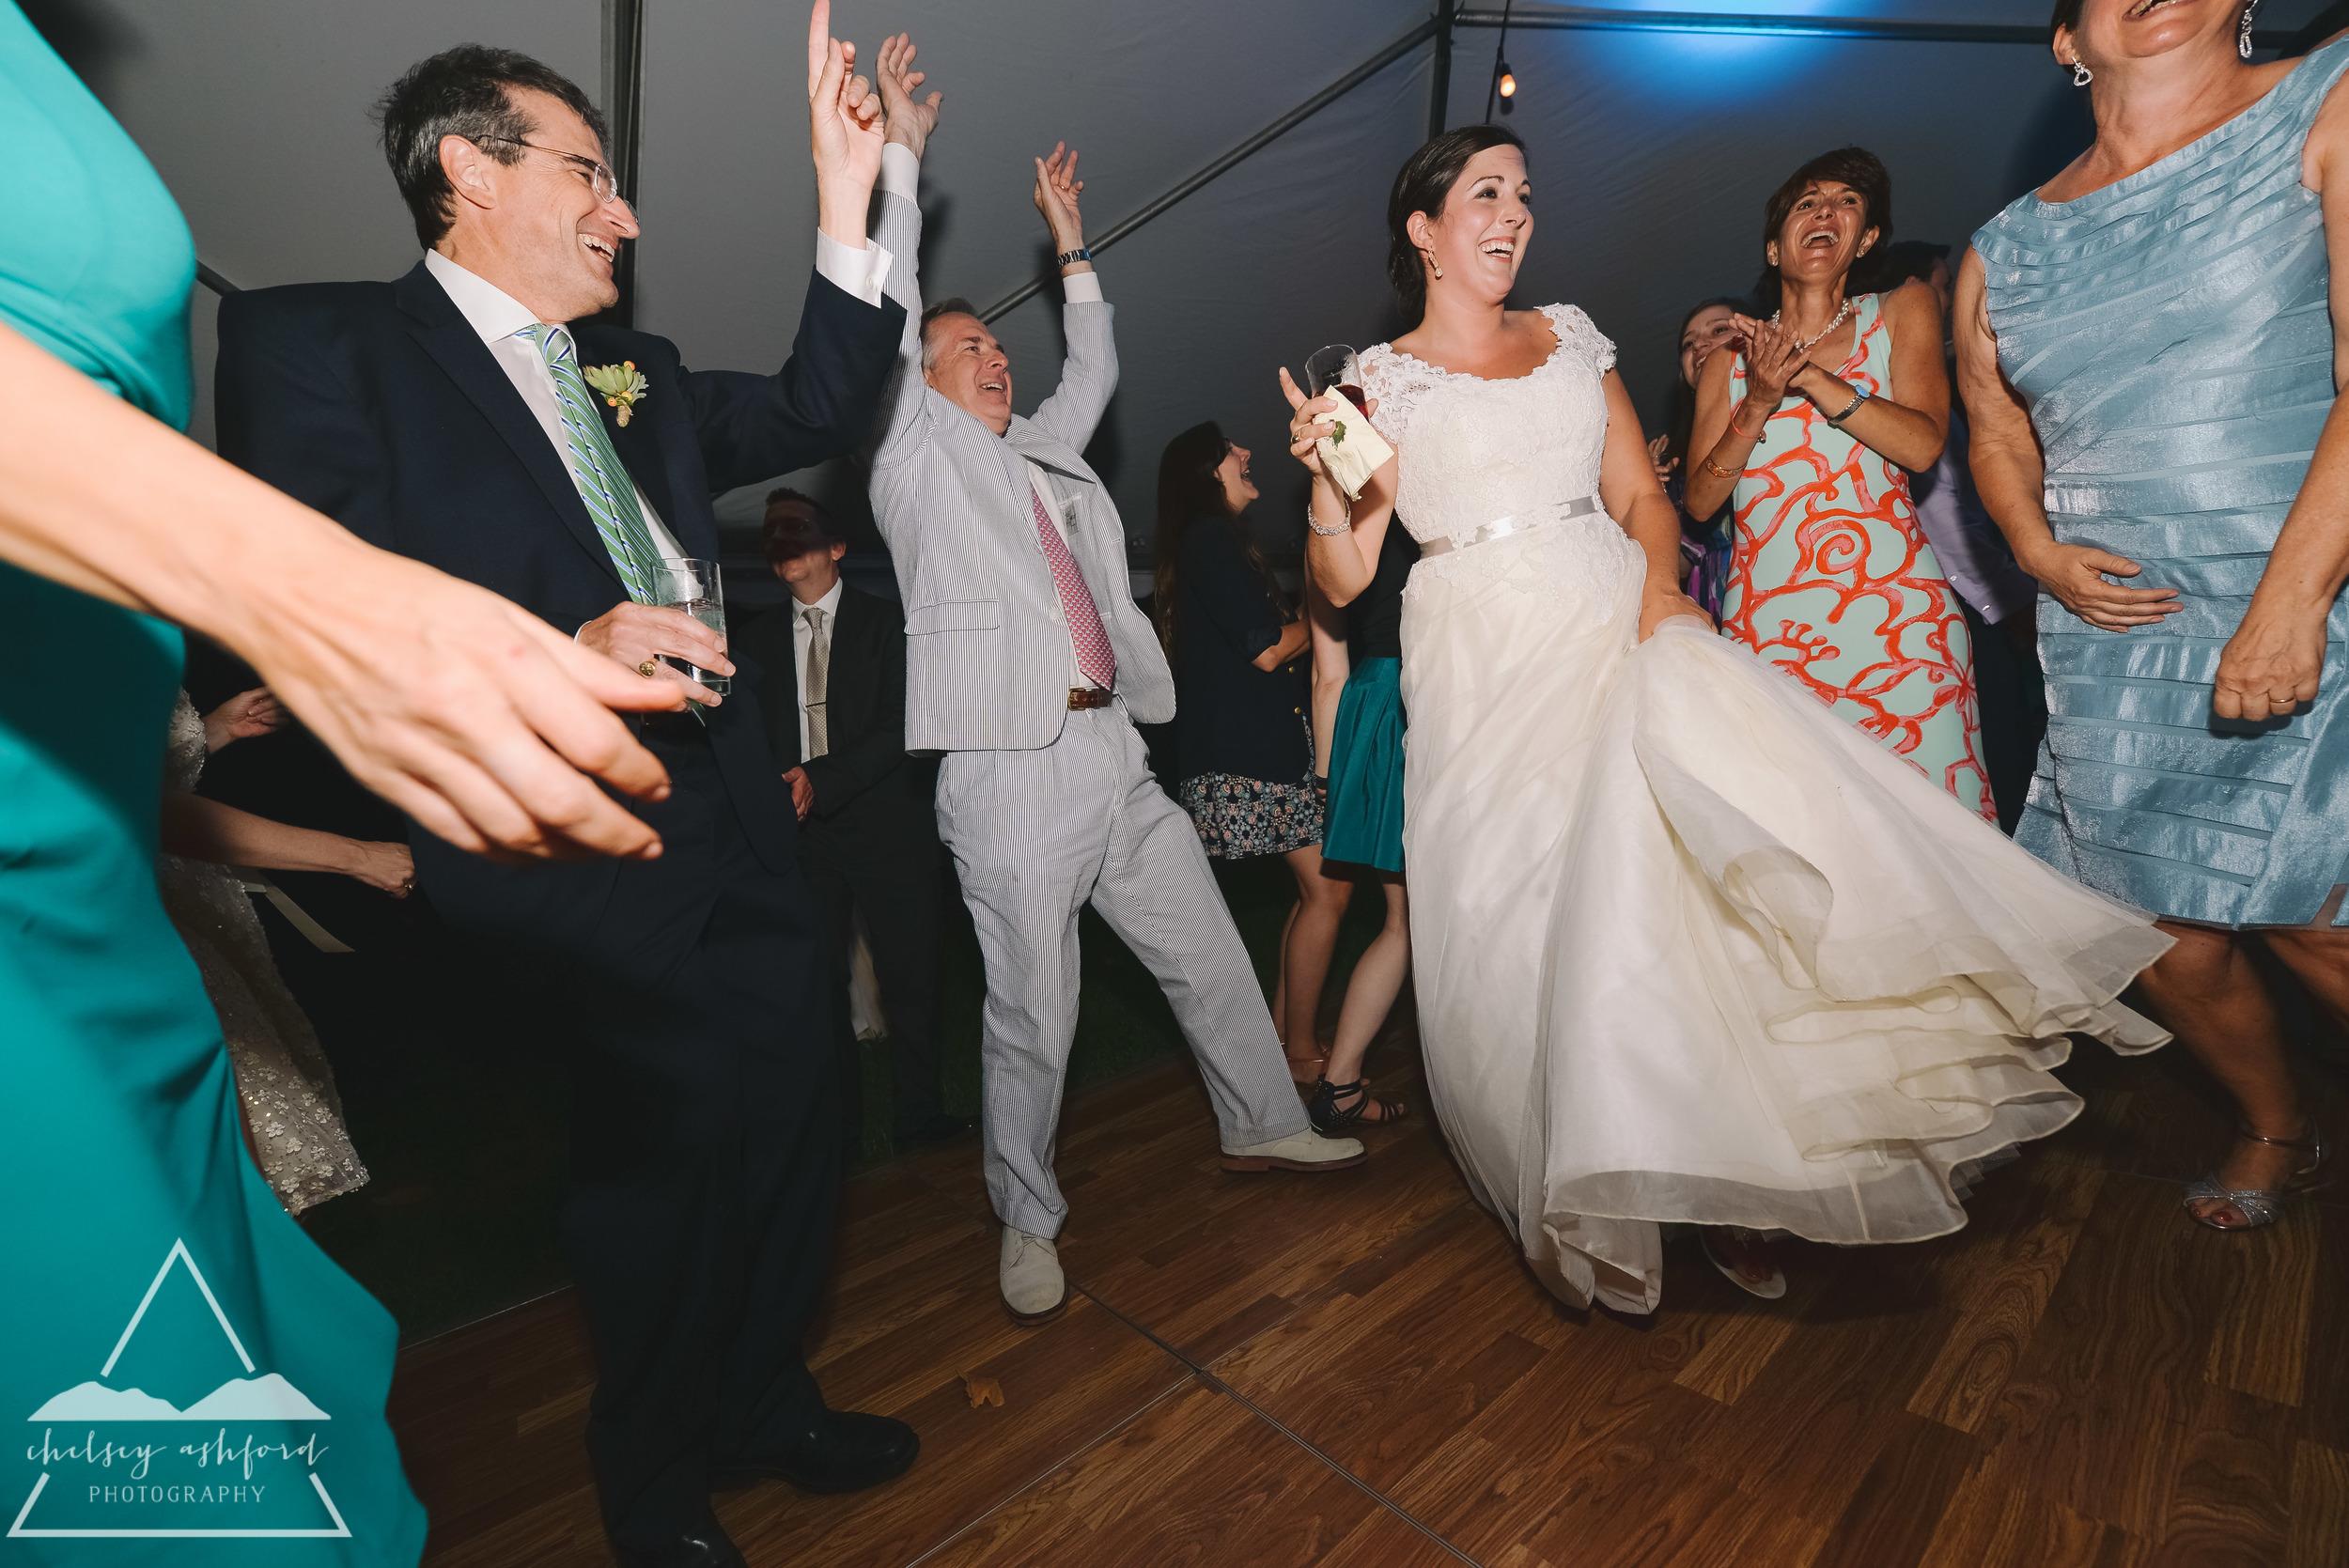 Clarkson_wedding_web-200.jpg